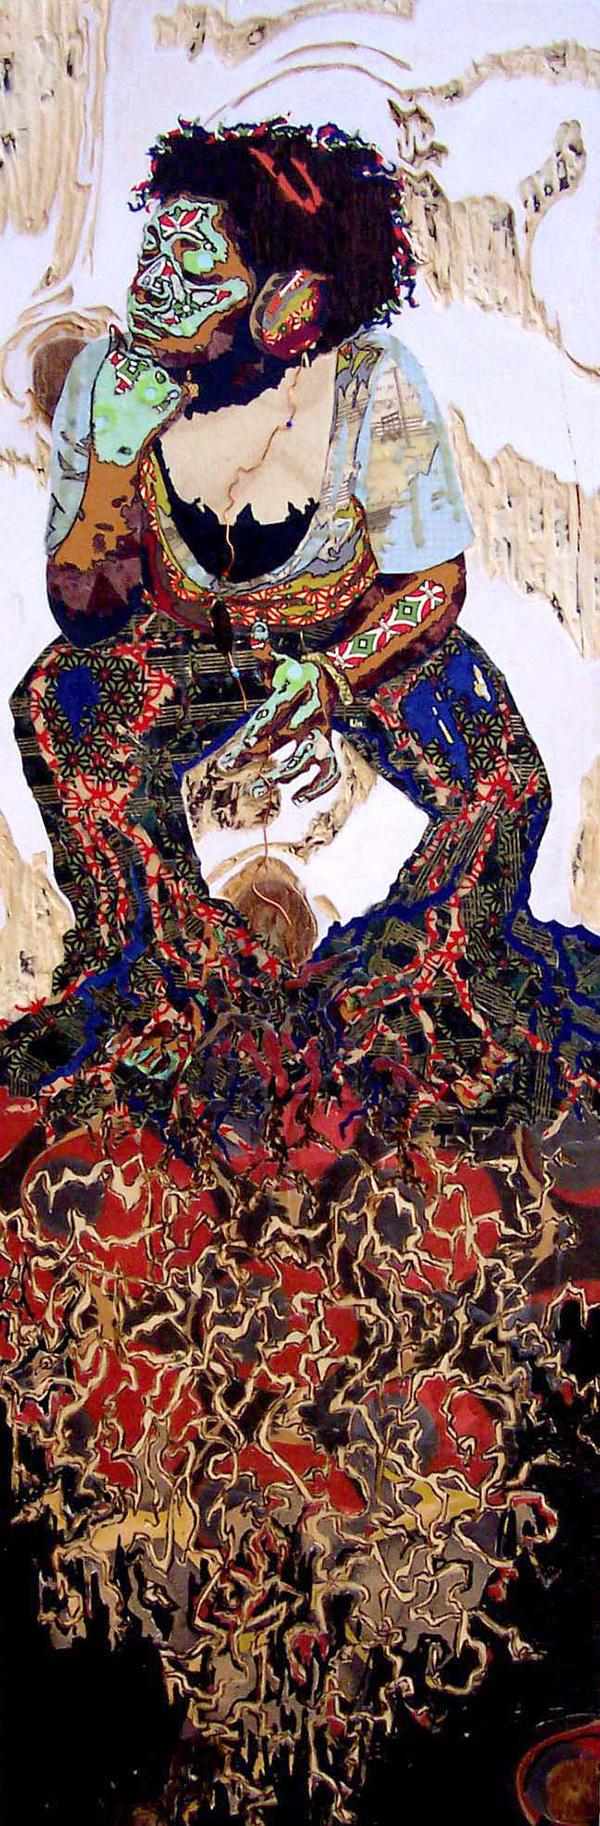 Lorna Williams-Ceremonial Act of Listening-2005-mixed media on wood-27x9.jpg